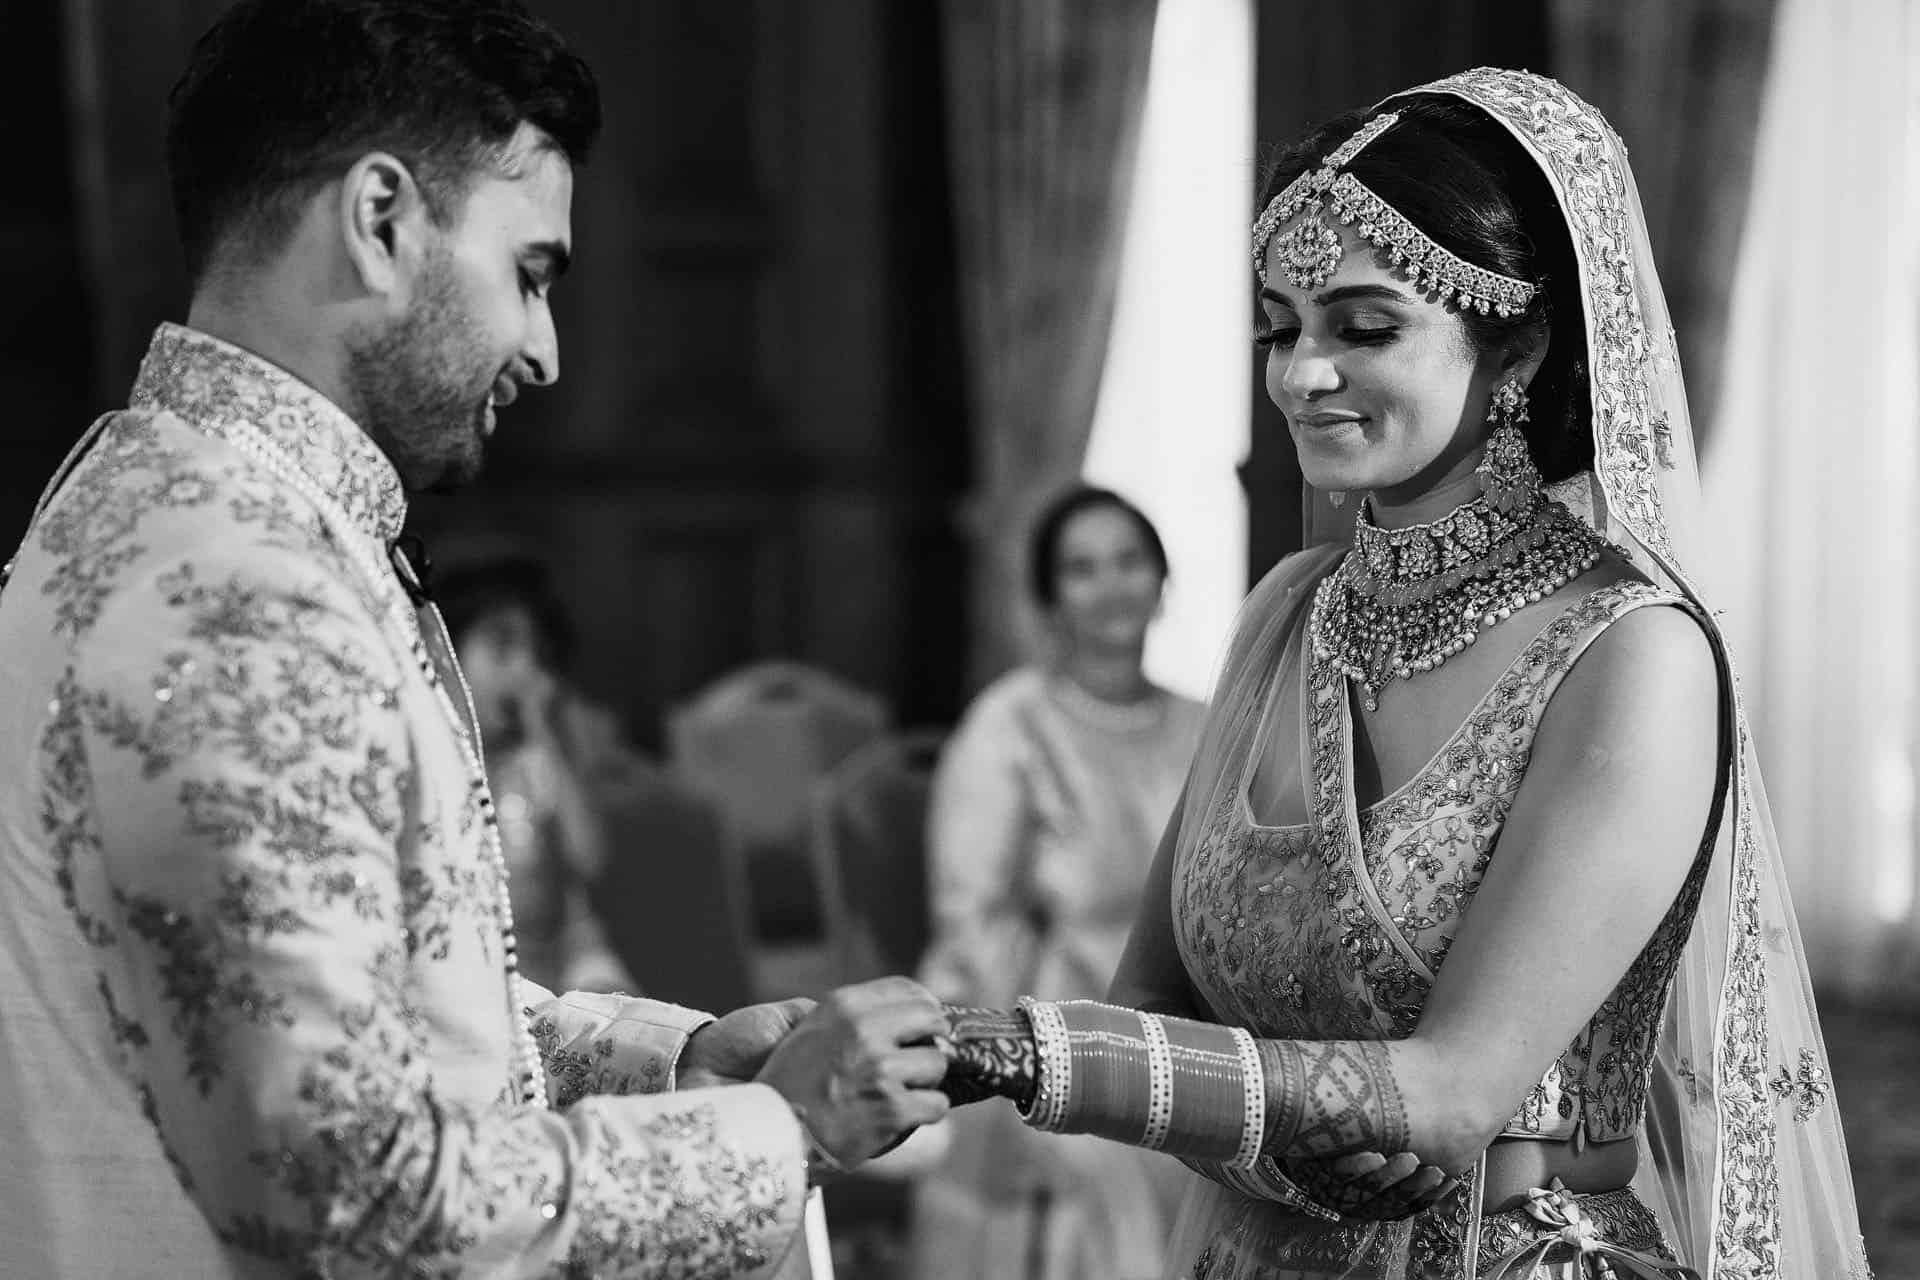 landmark hotel london wedding photography